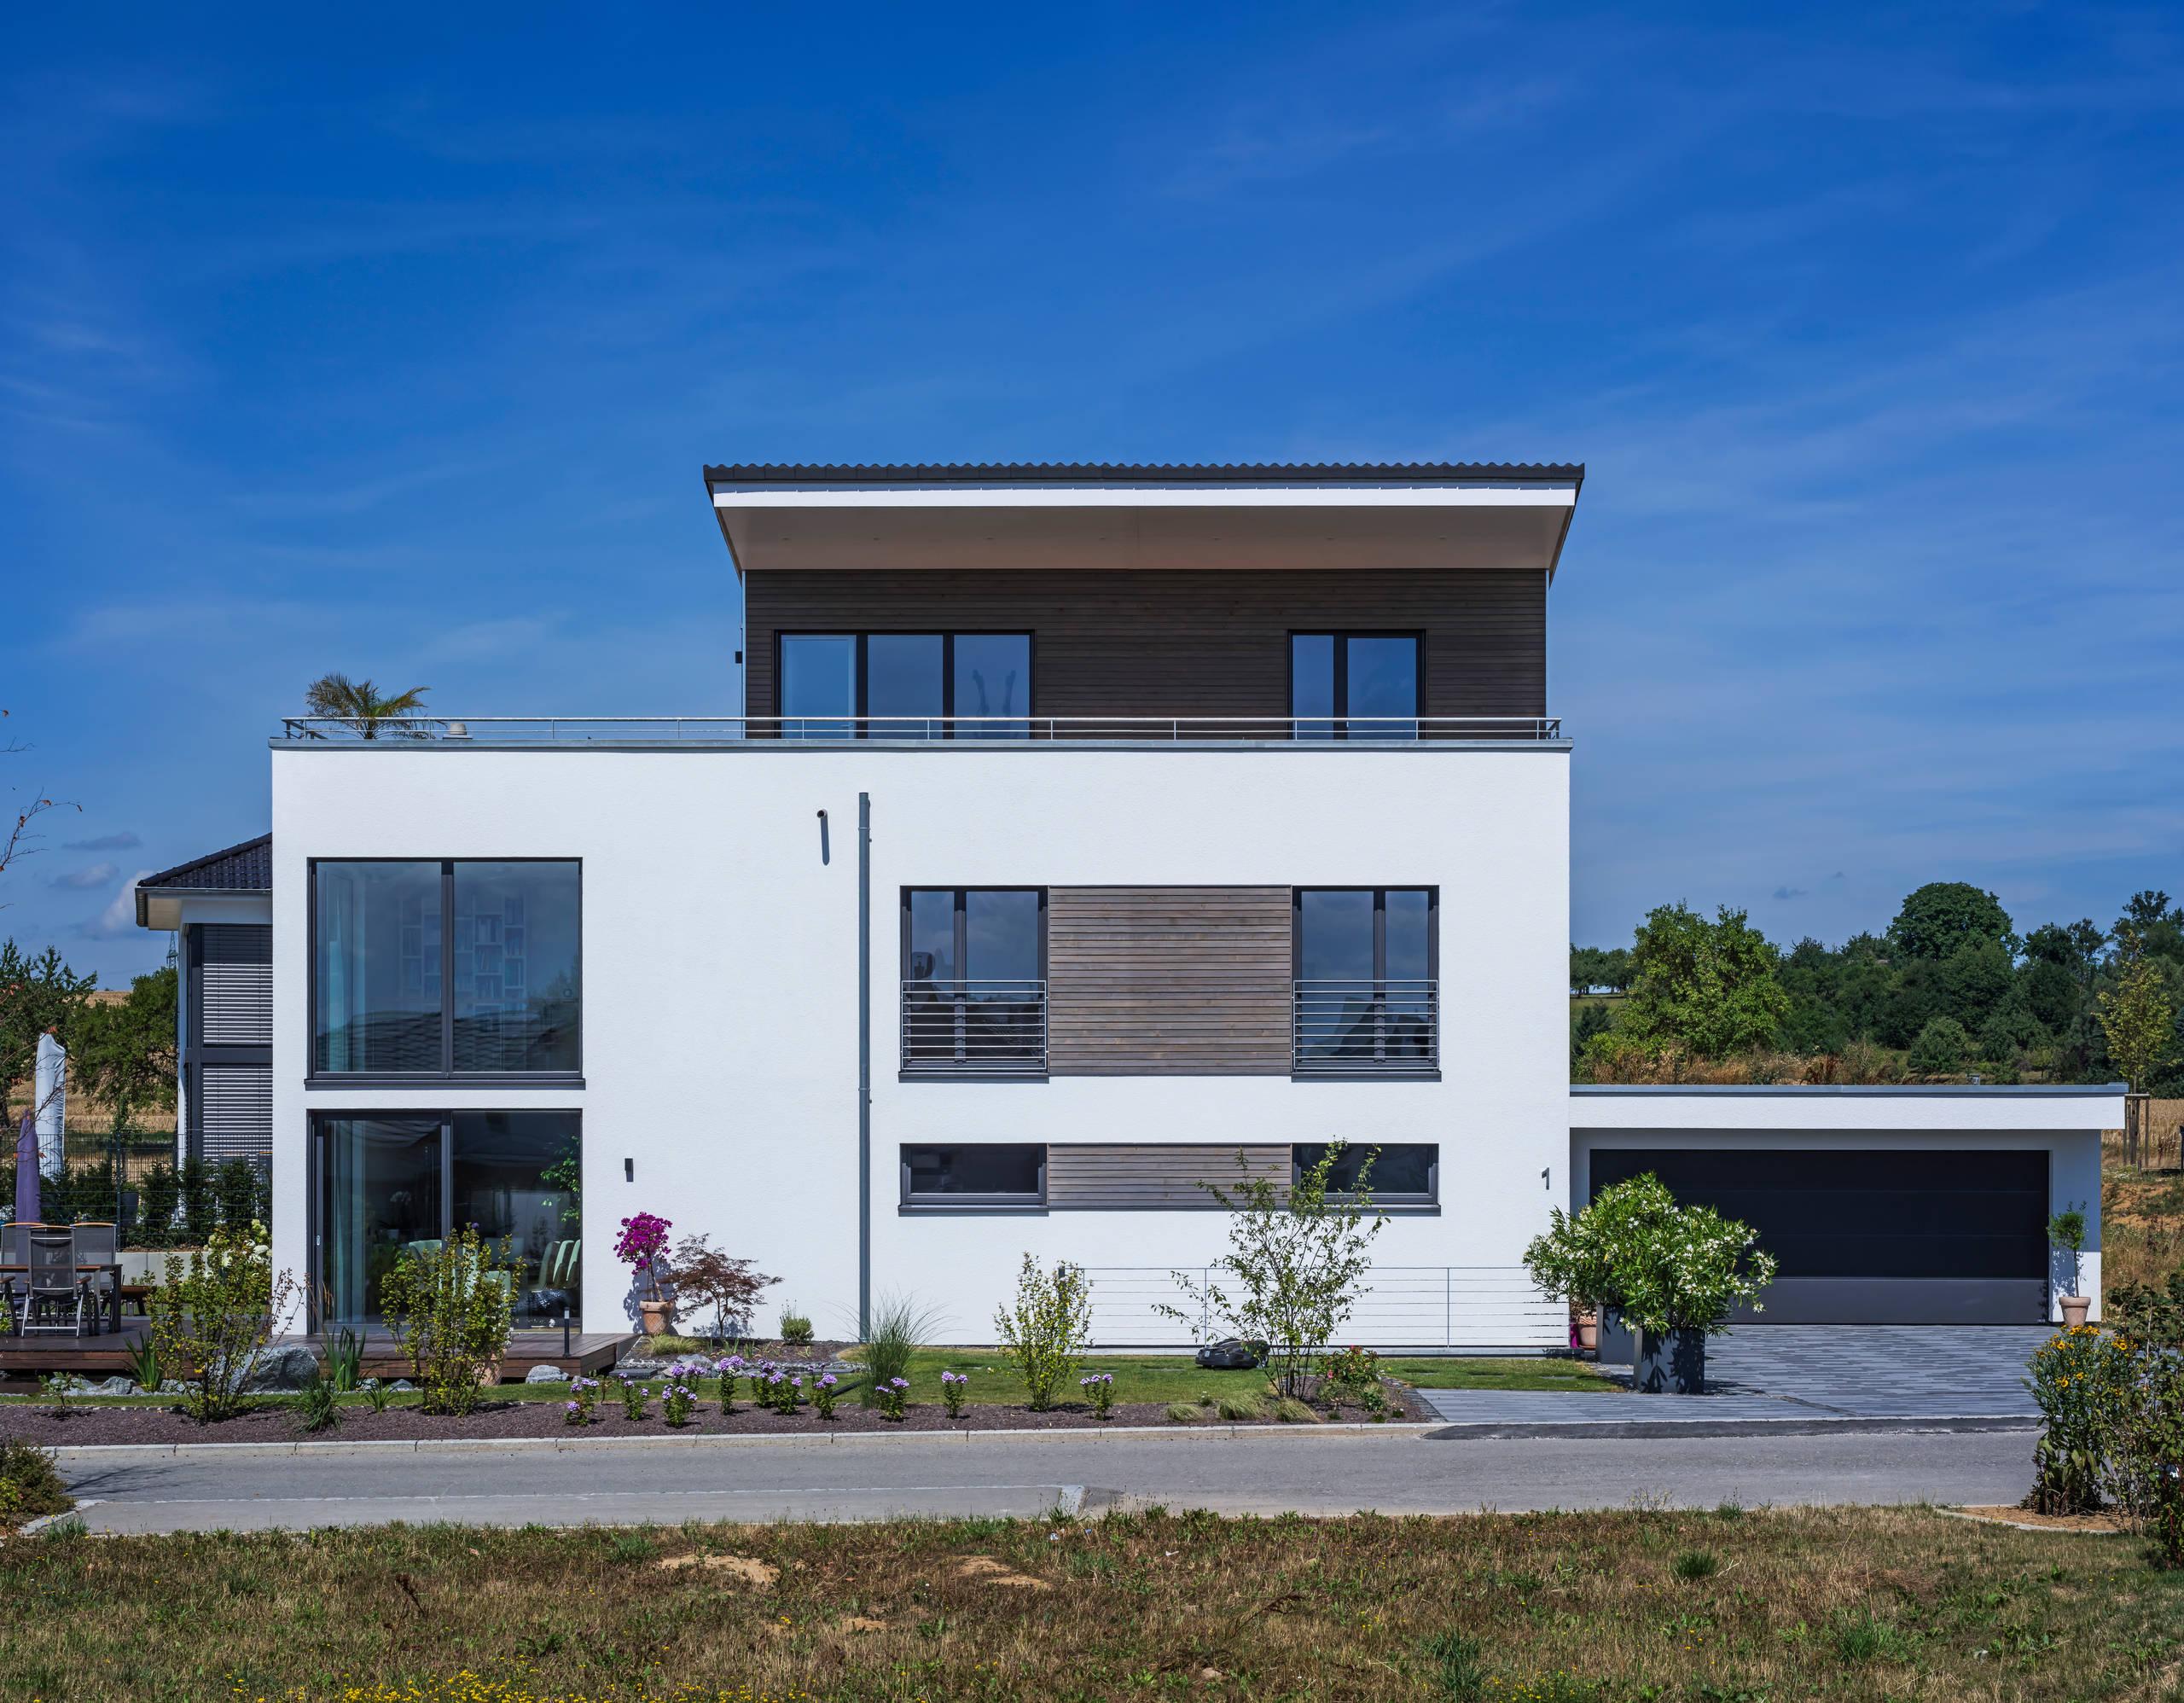 15 Stunning Modern Home Exterior Designs That Make A Statement on Modern House Ideas  id=35615